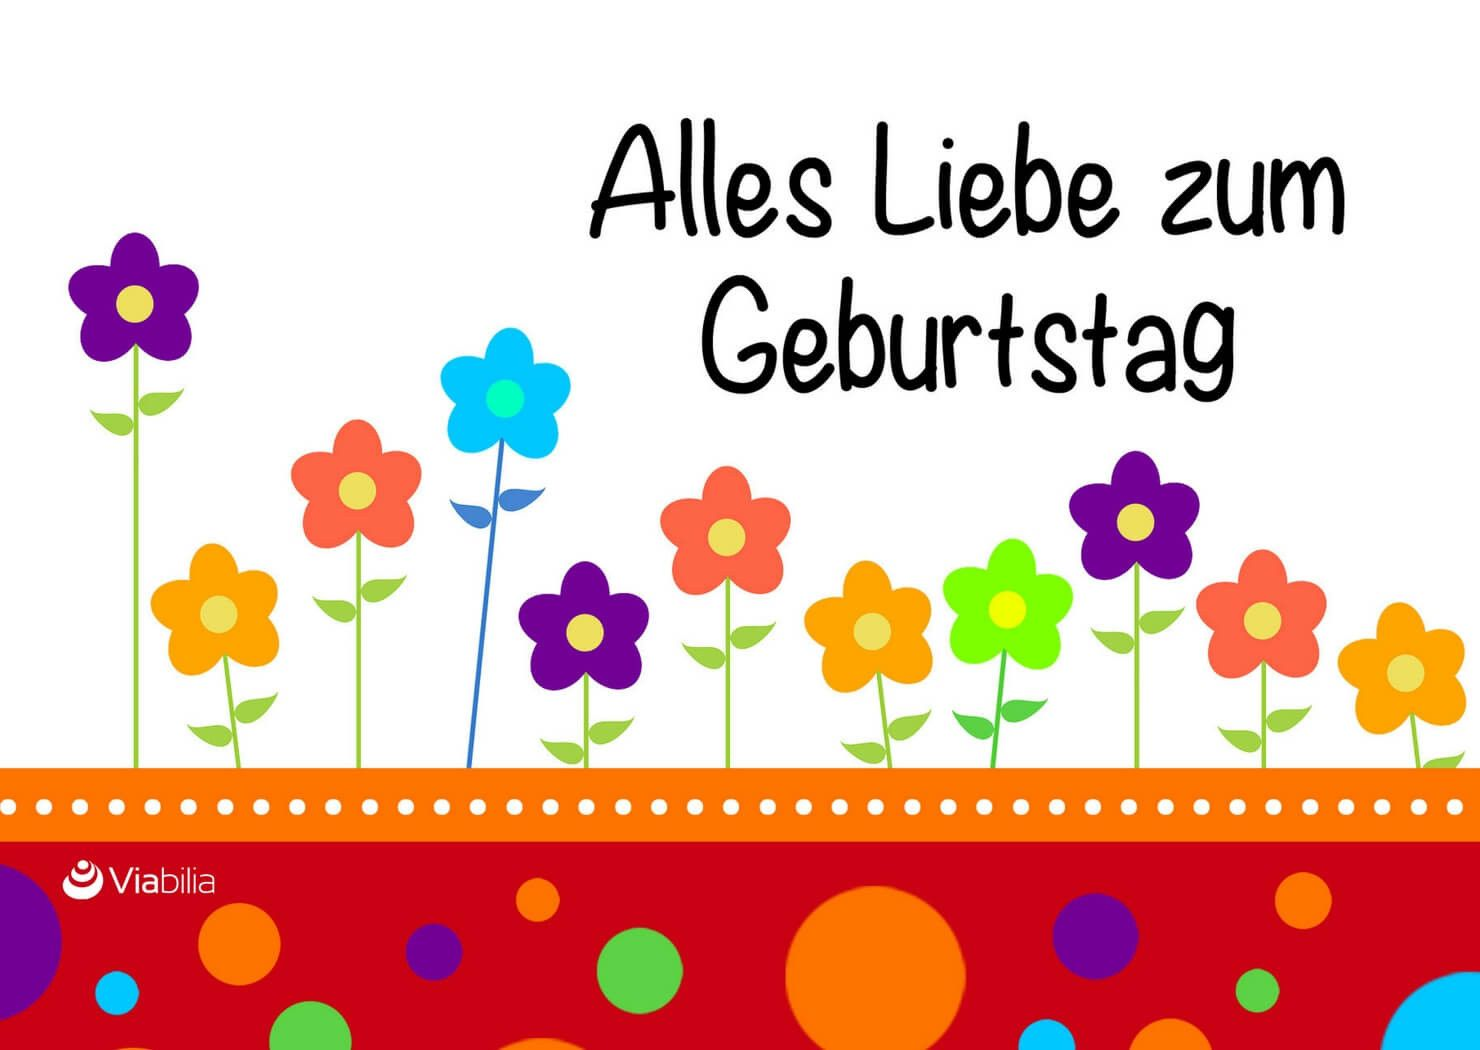 Geburtstagswunsche karten gratis ausdrucken